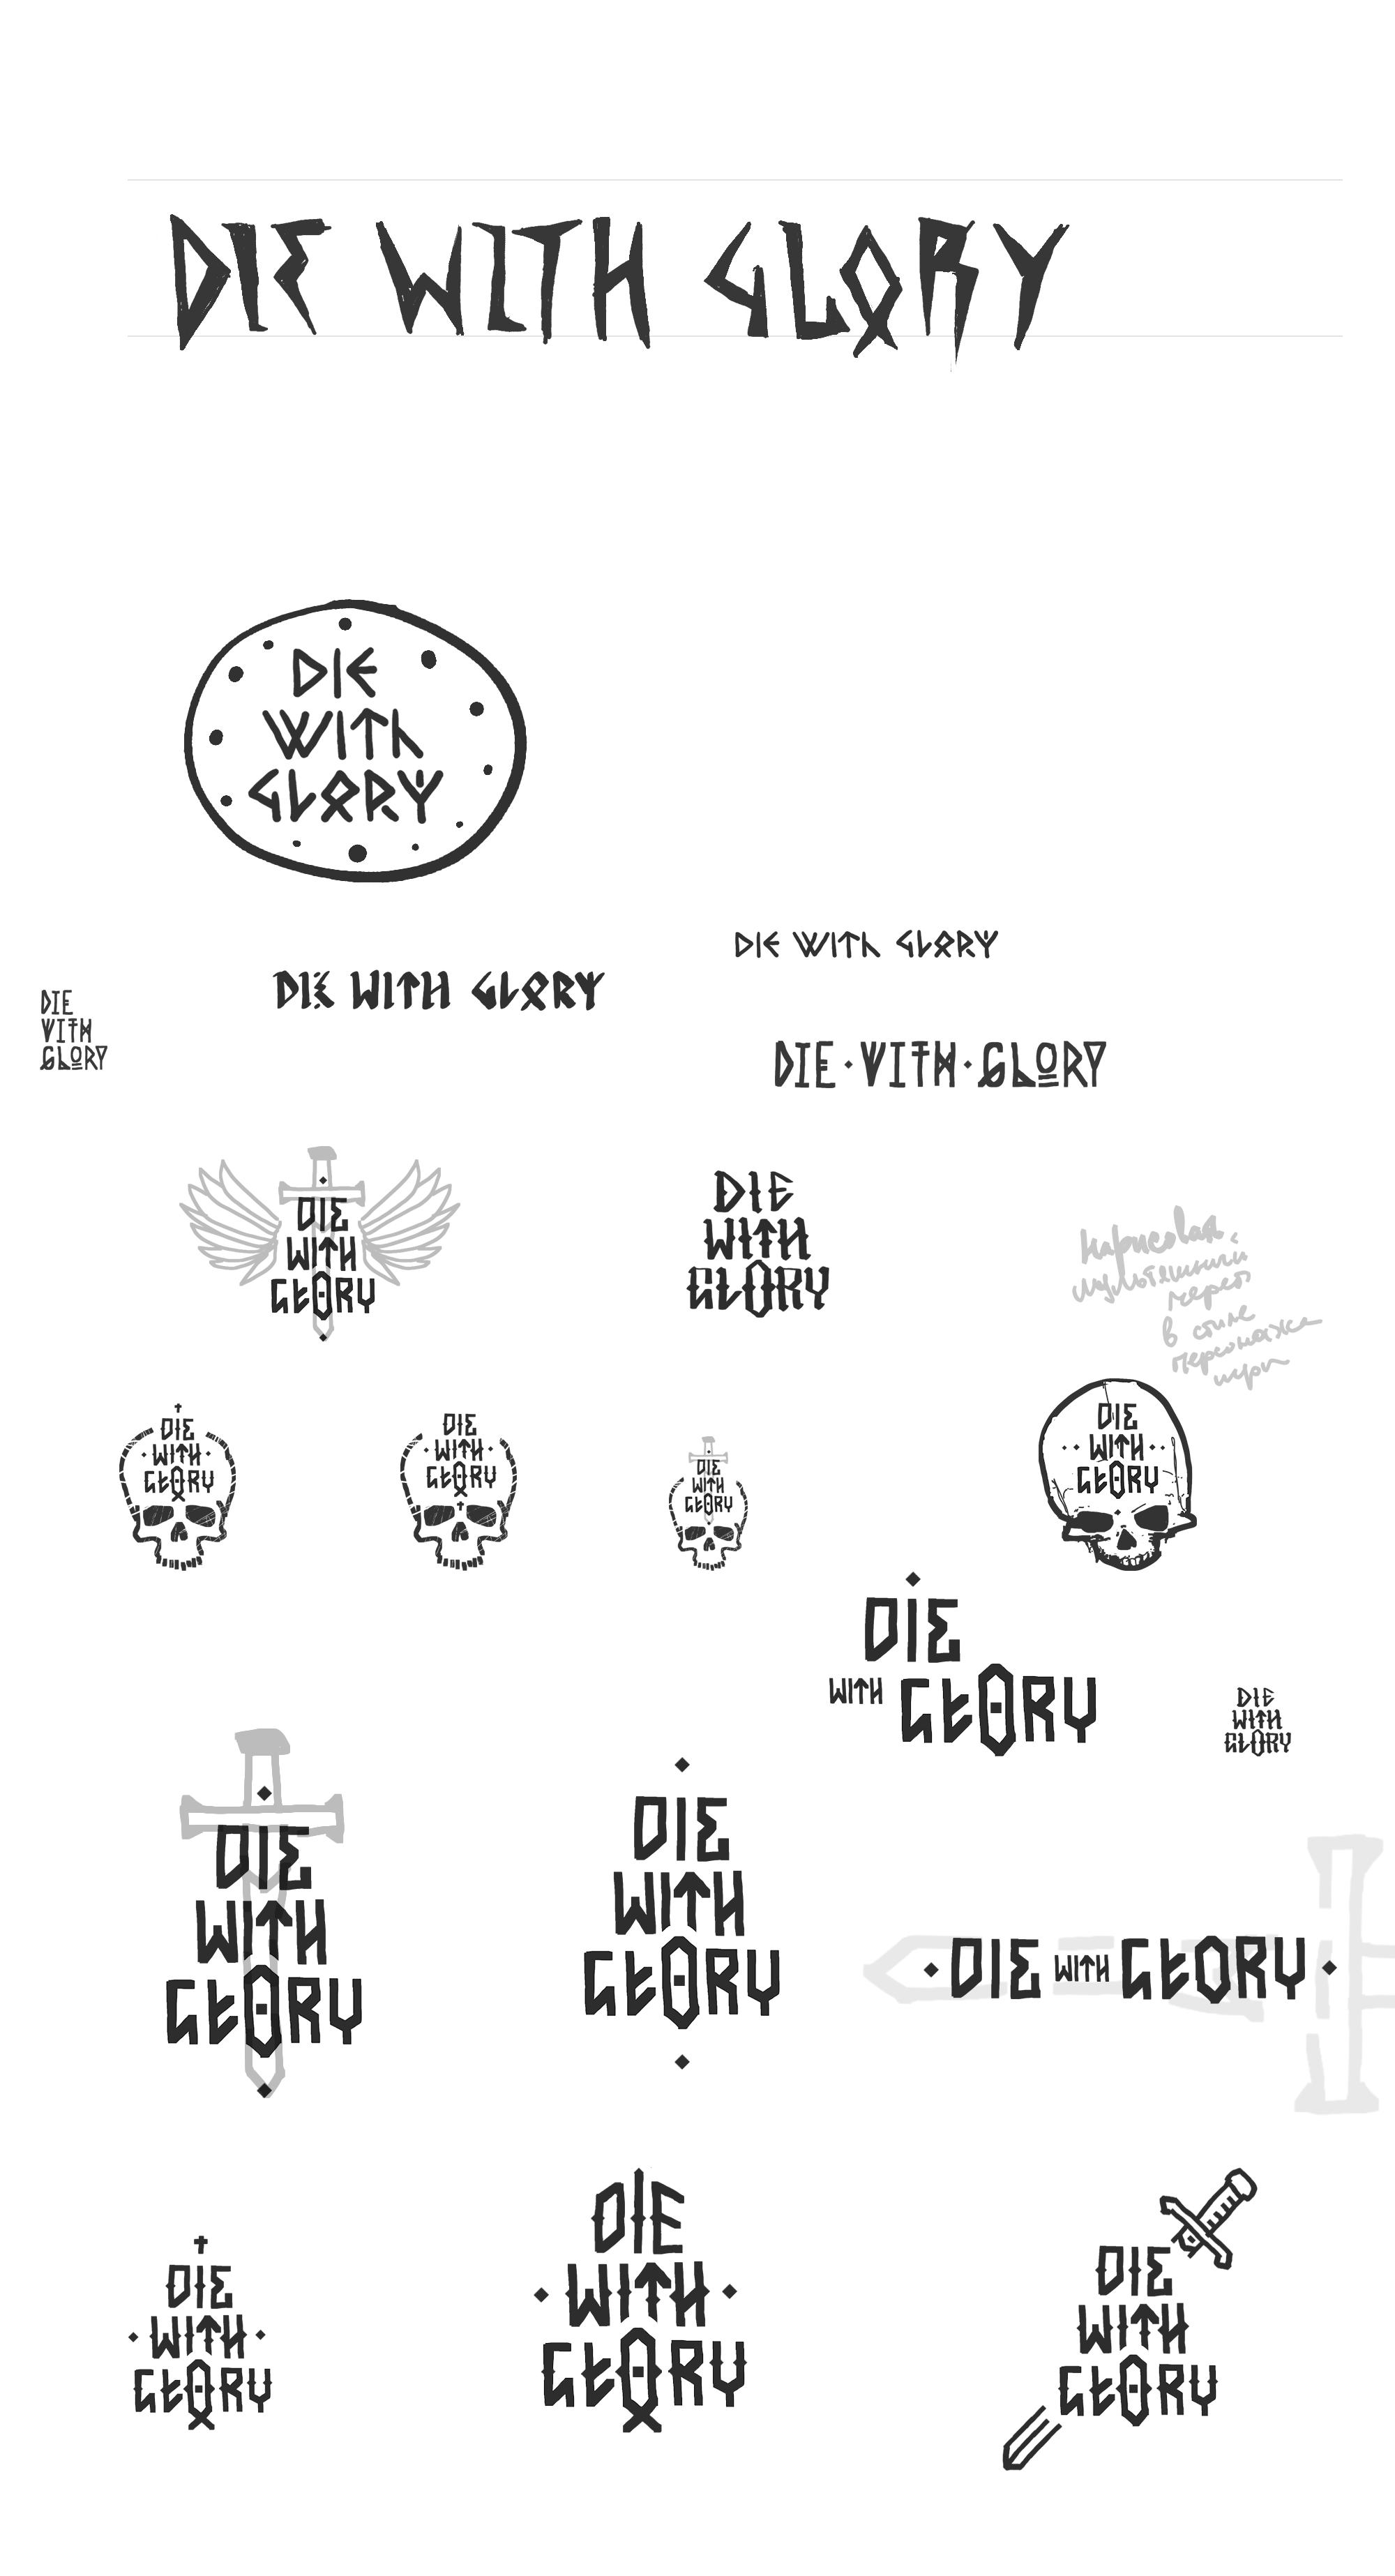 Die With Glory – скетчи логотипа - Изображение 5